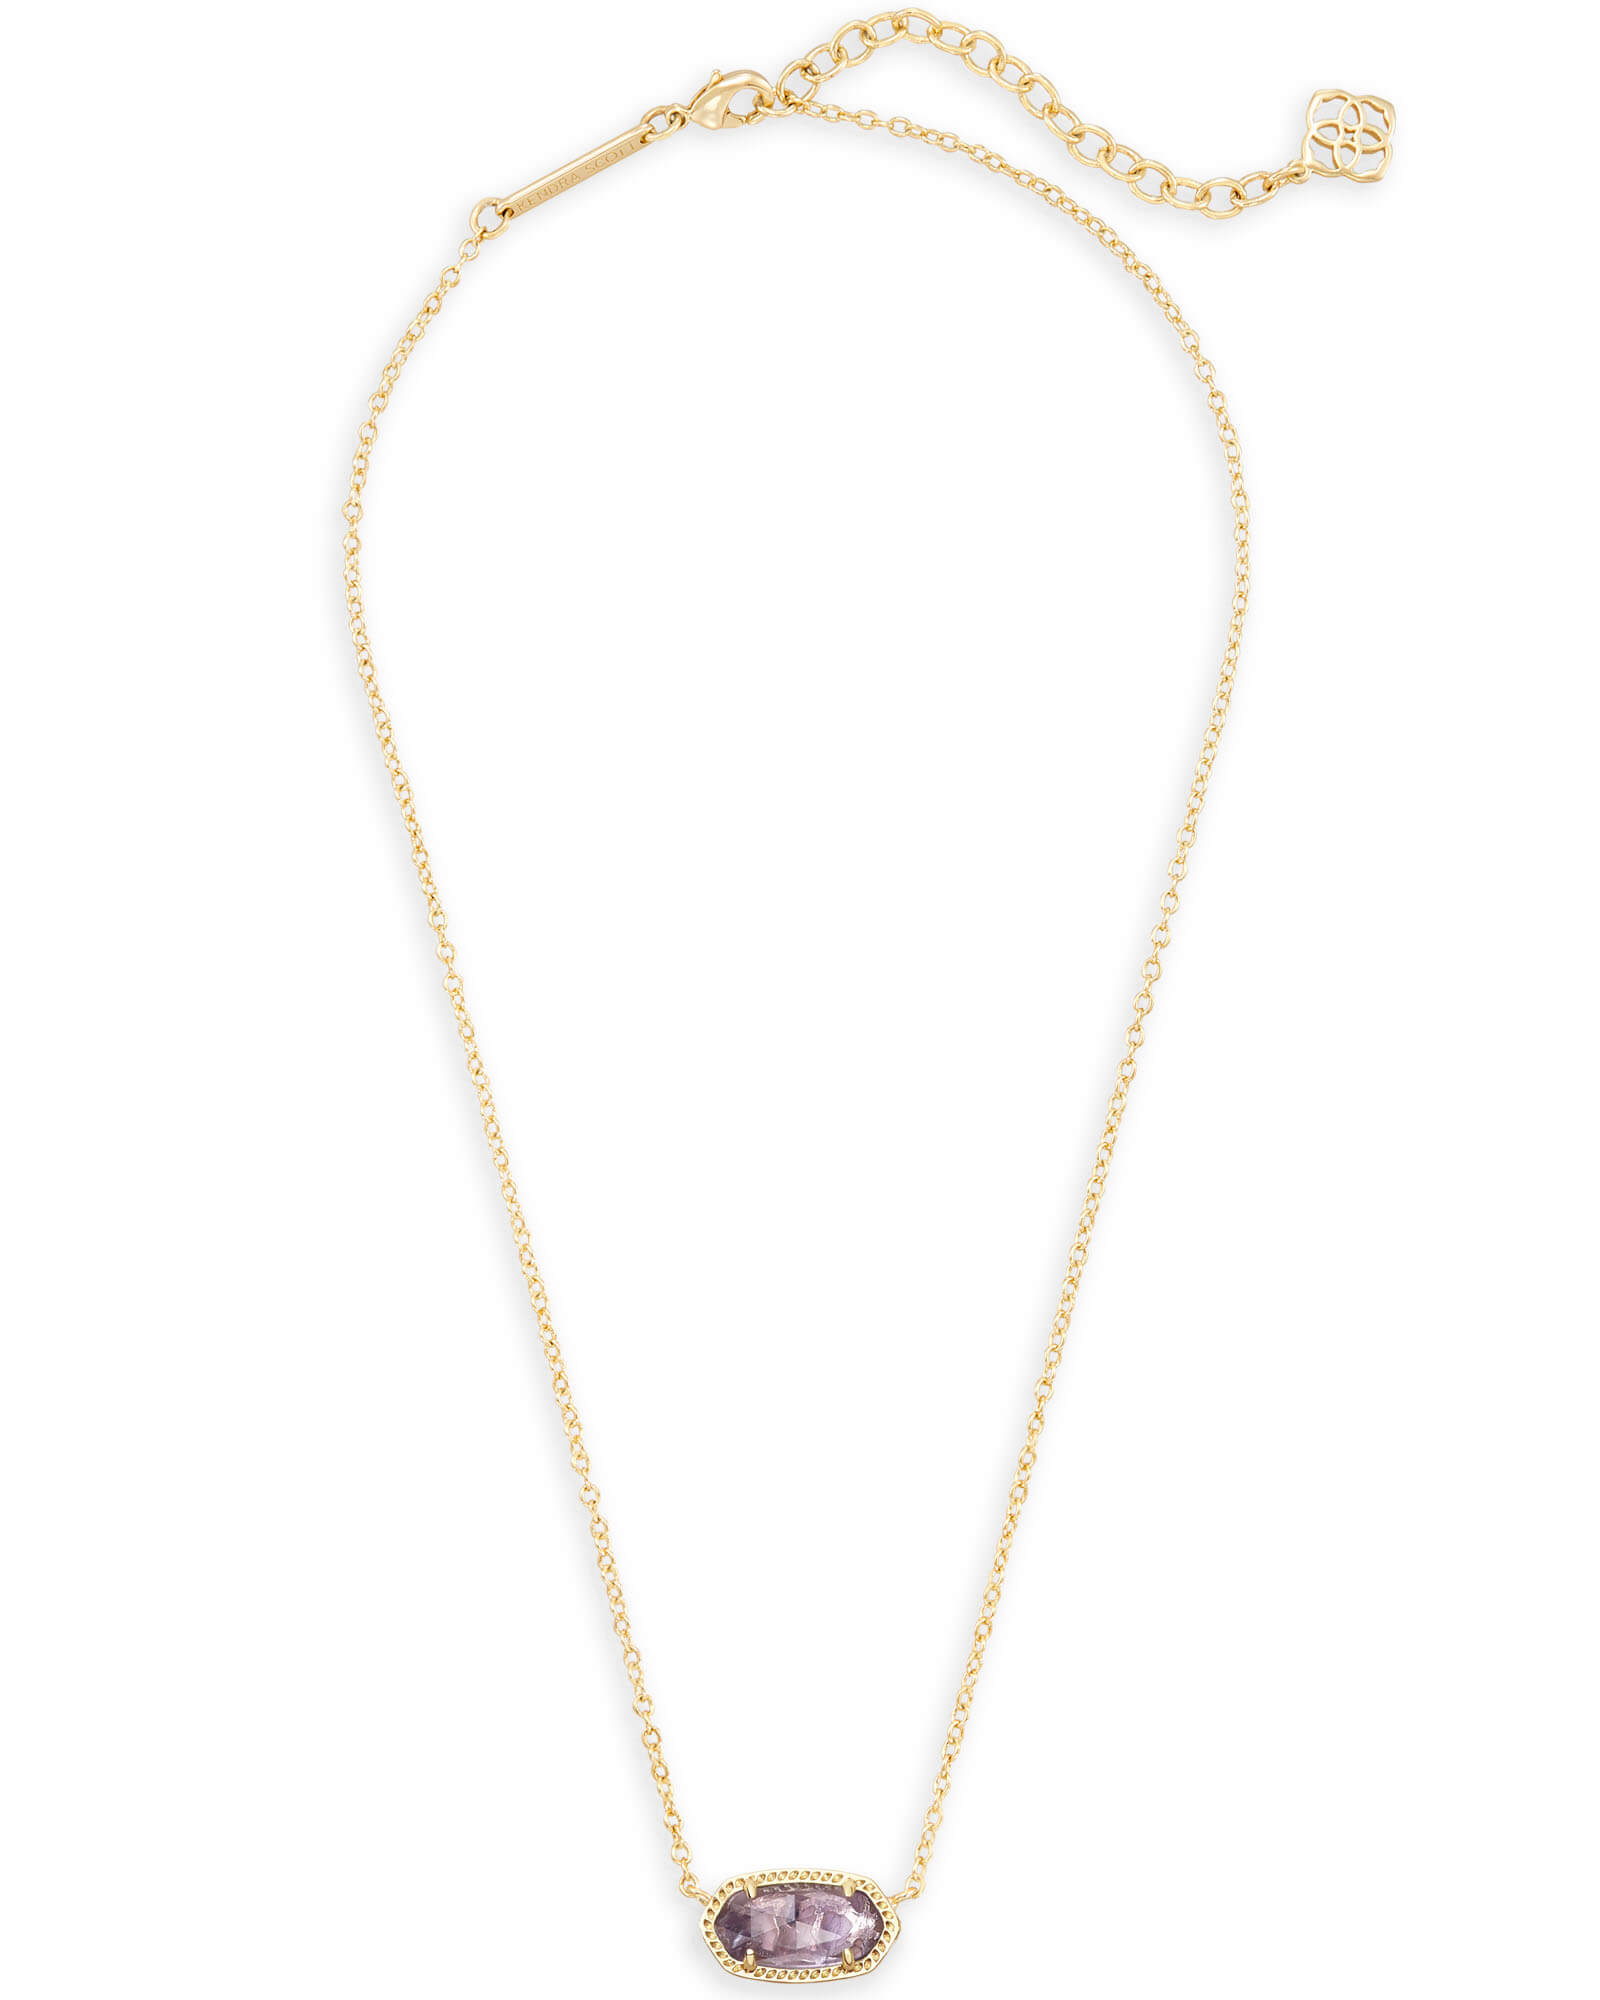 58808fd1c6fc89 Elisa Gold Pendant Necklace in Amethyst | Kendra Scott